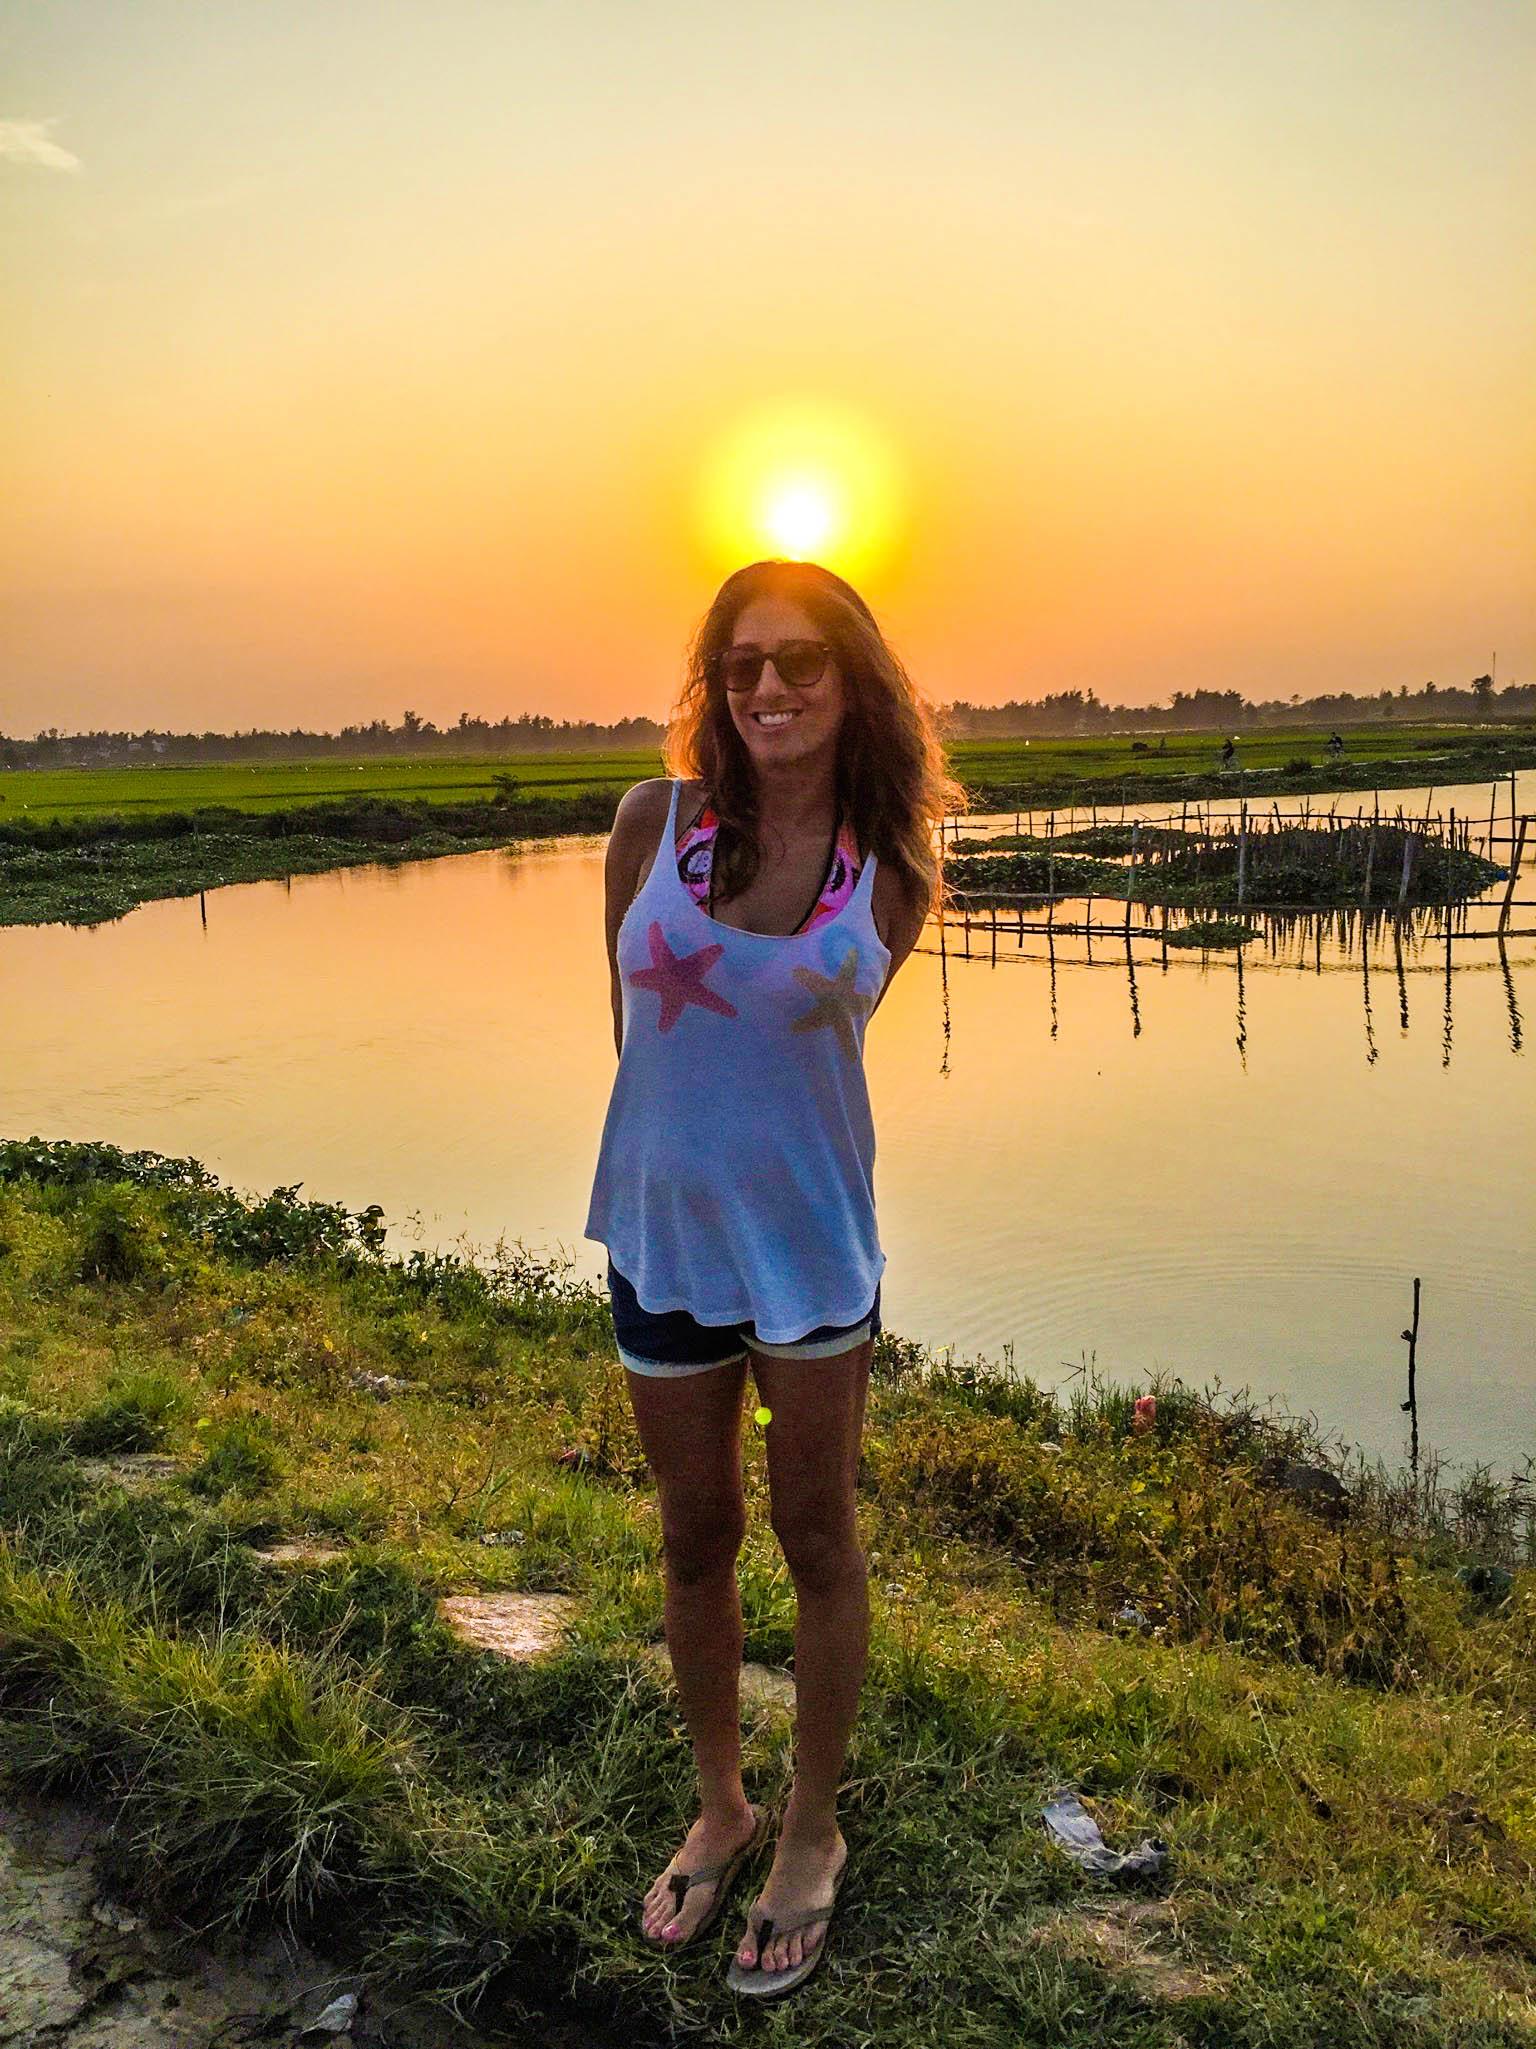 Copy of Glorious sunset